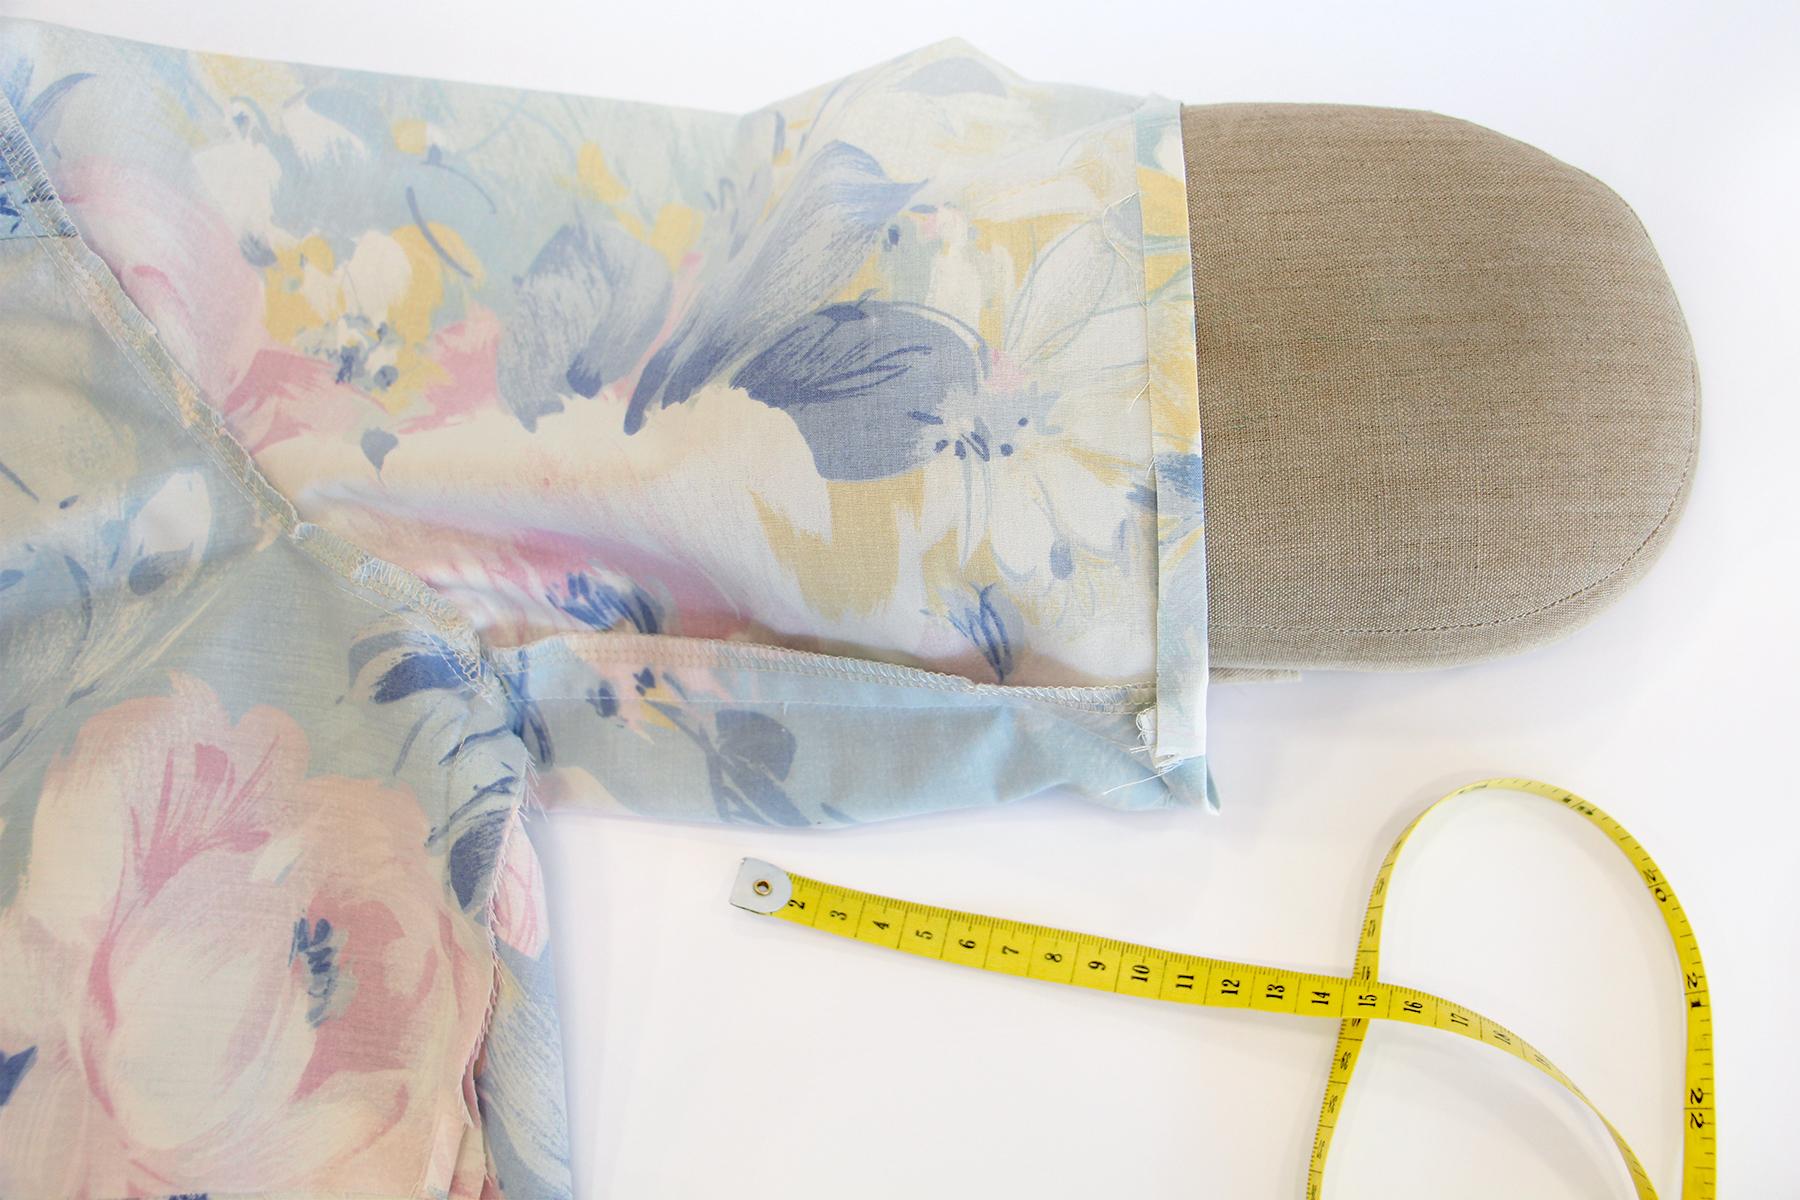 Megan Nielsen Patterns | Matilda Sewalong: Sleeves - First Sleeve Hem Fold